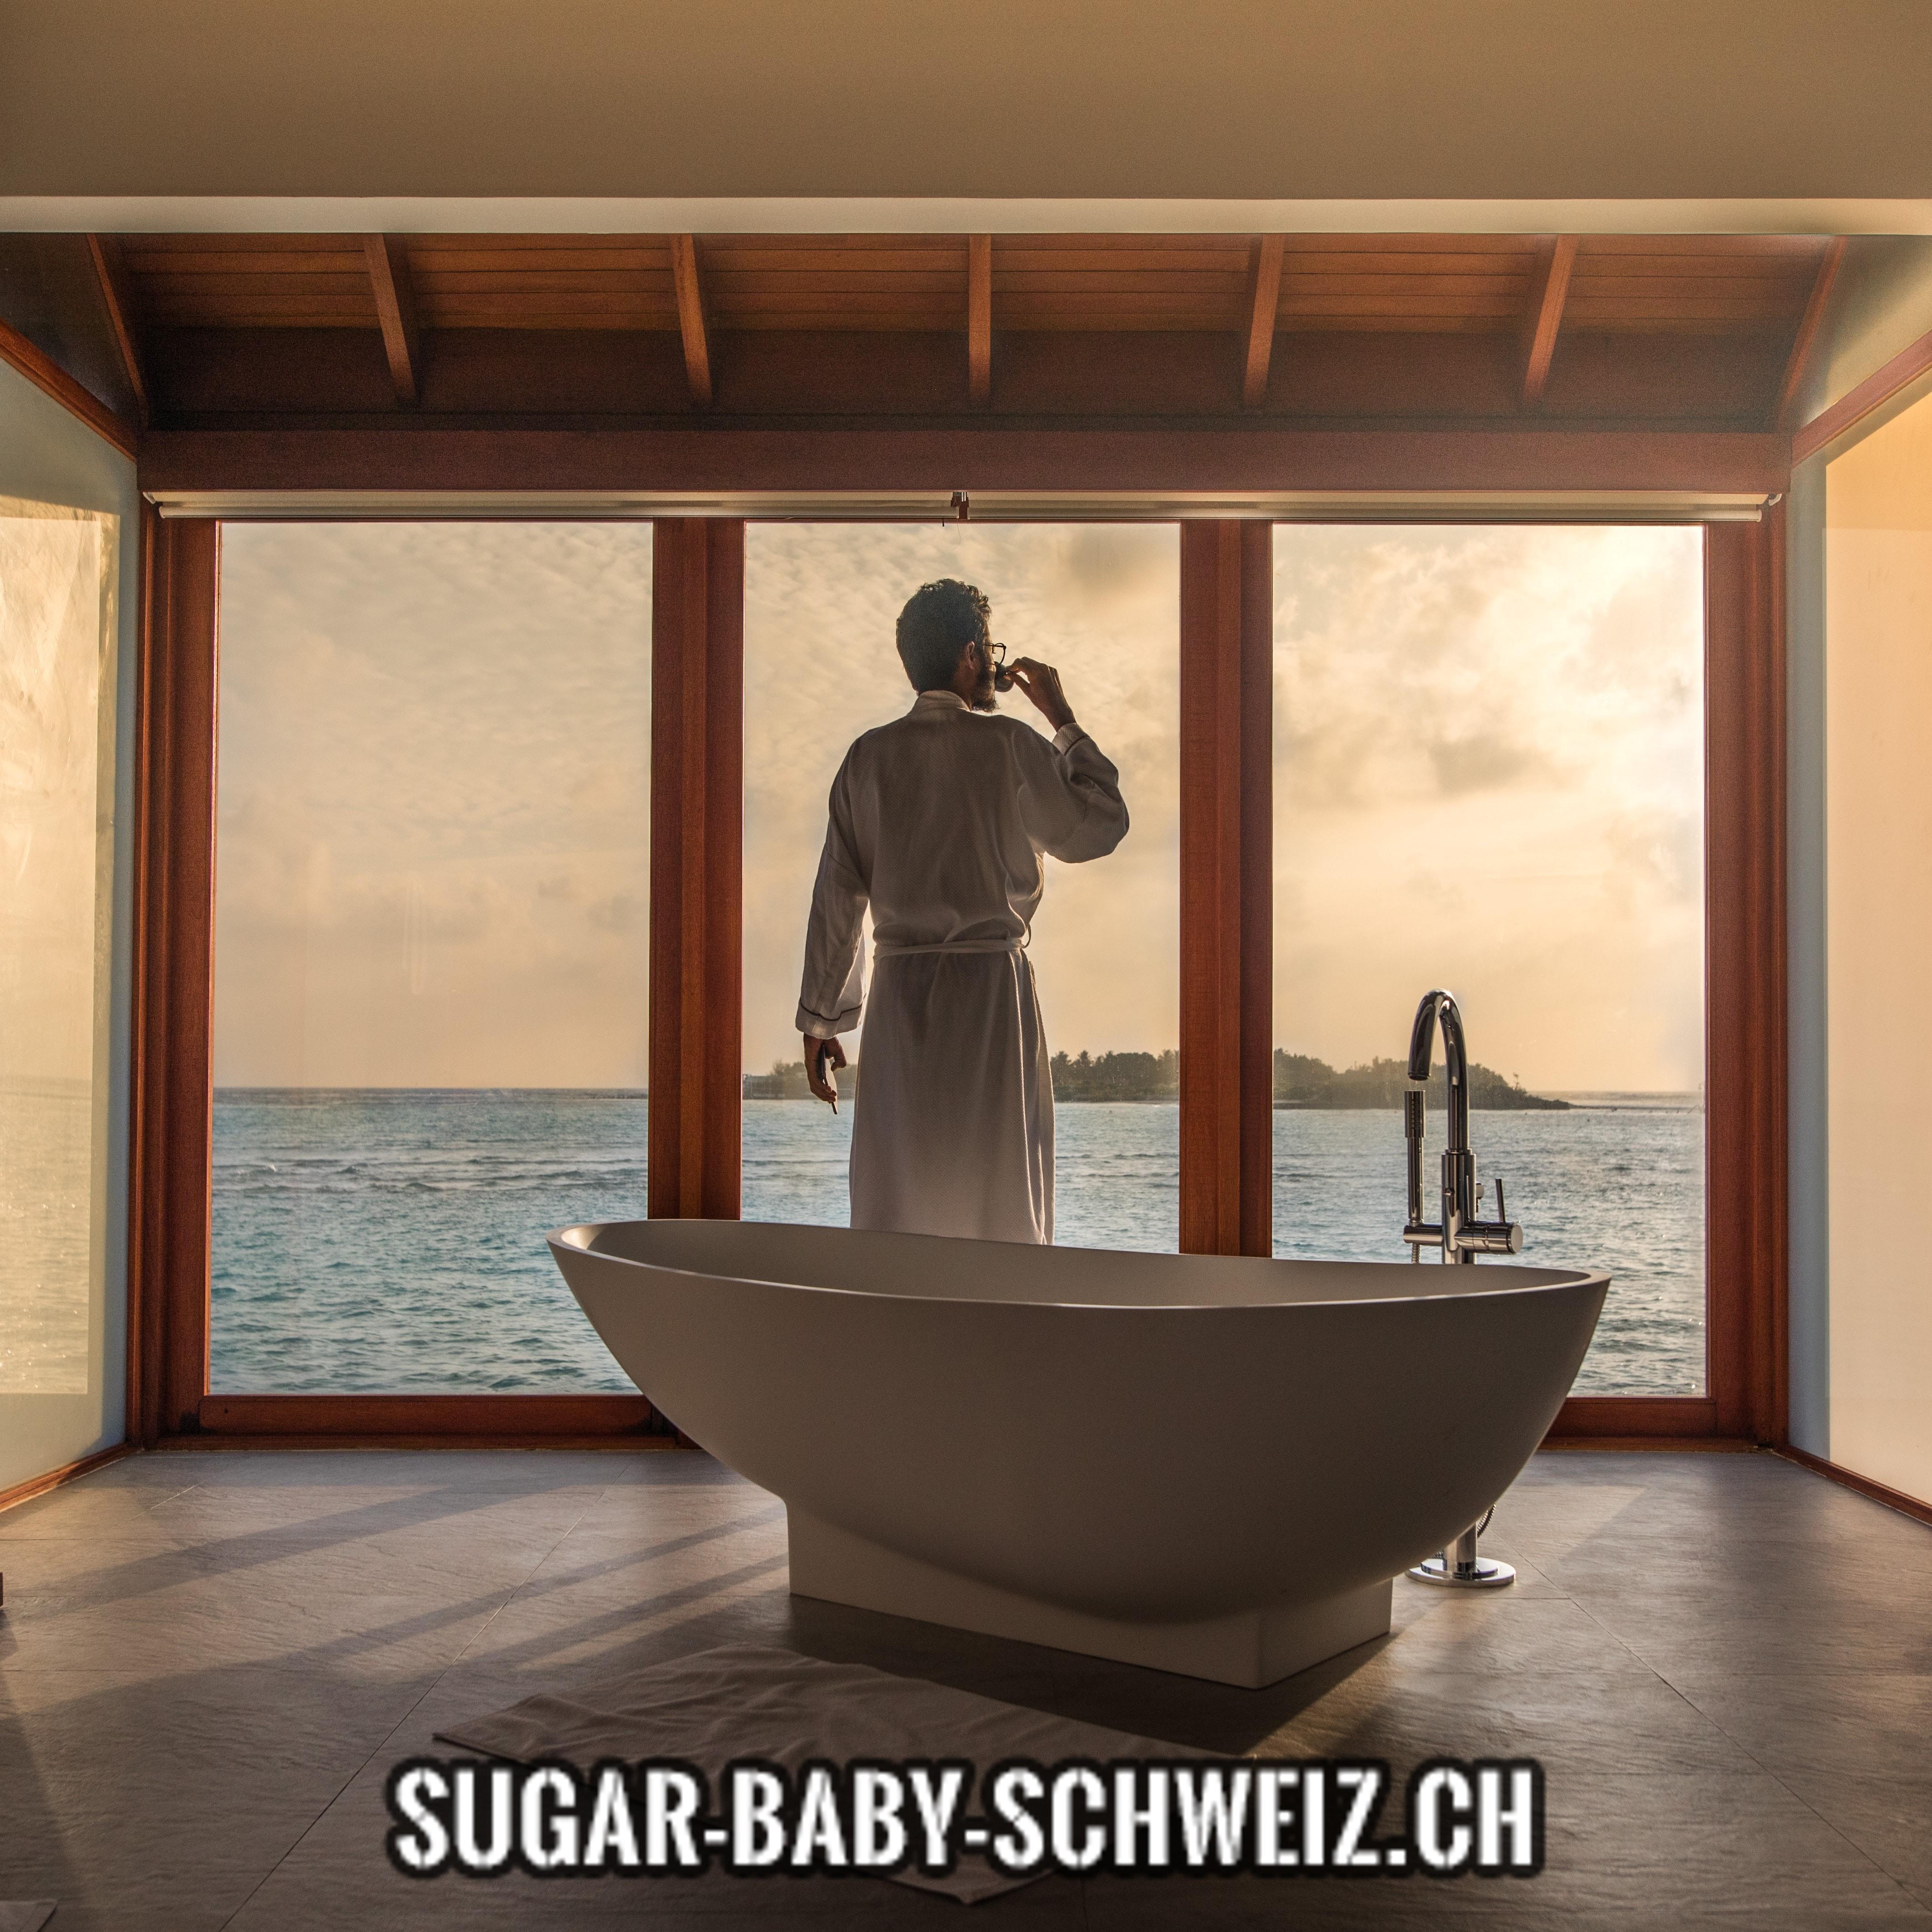 Millionäre Schweiz